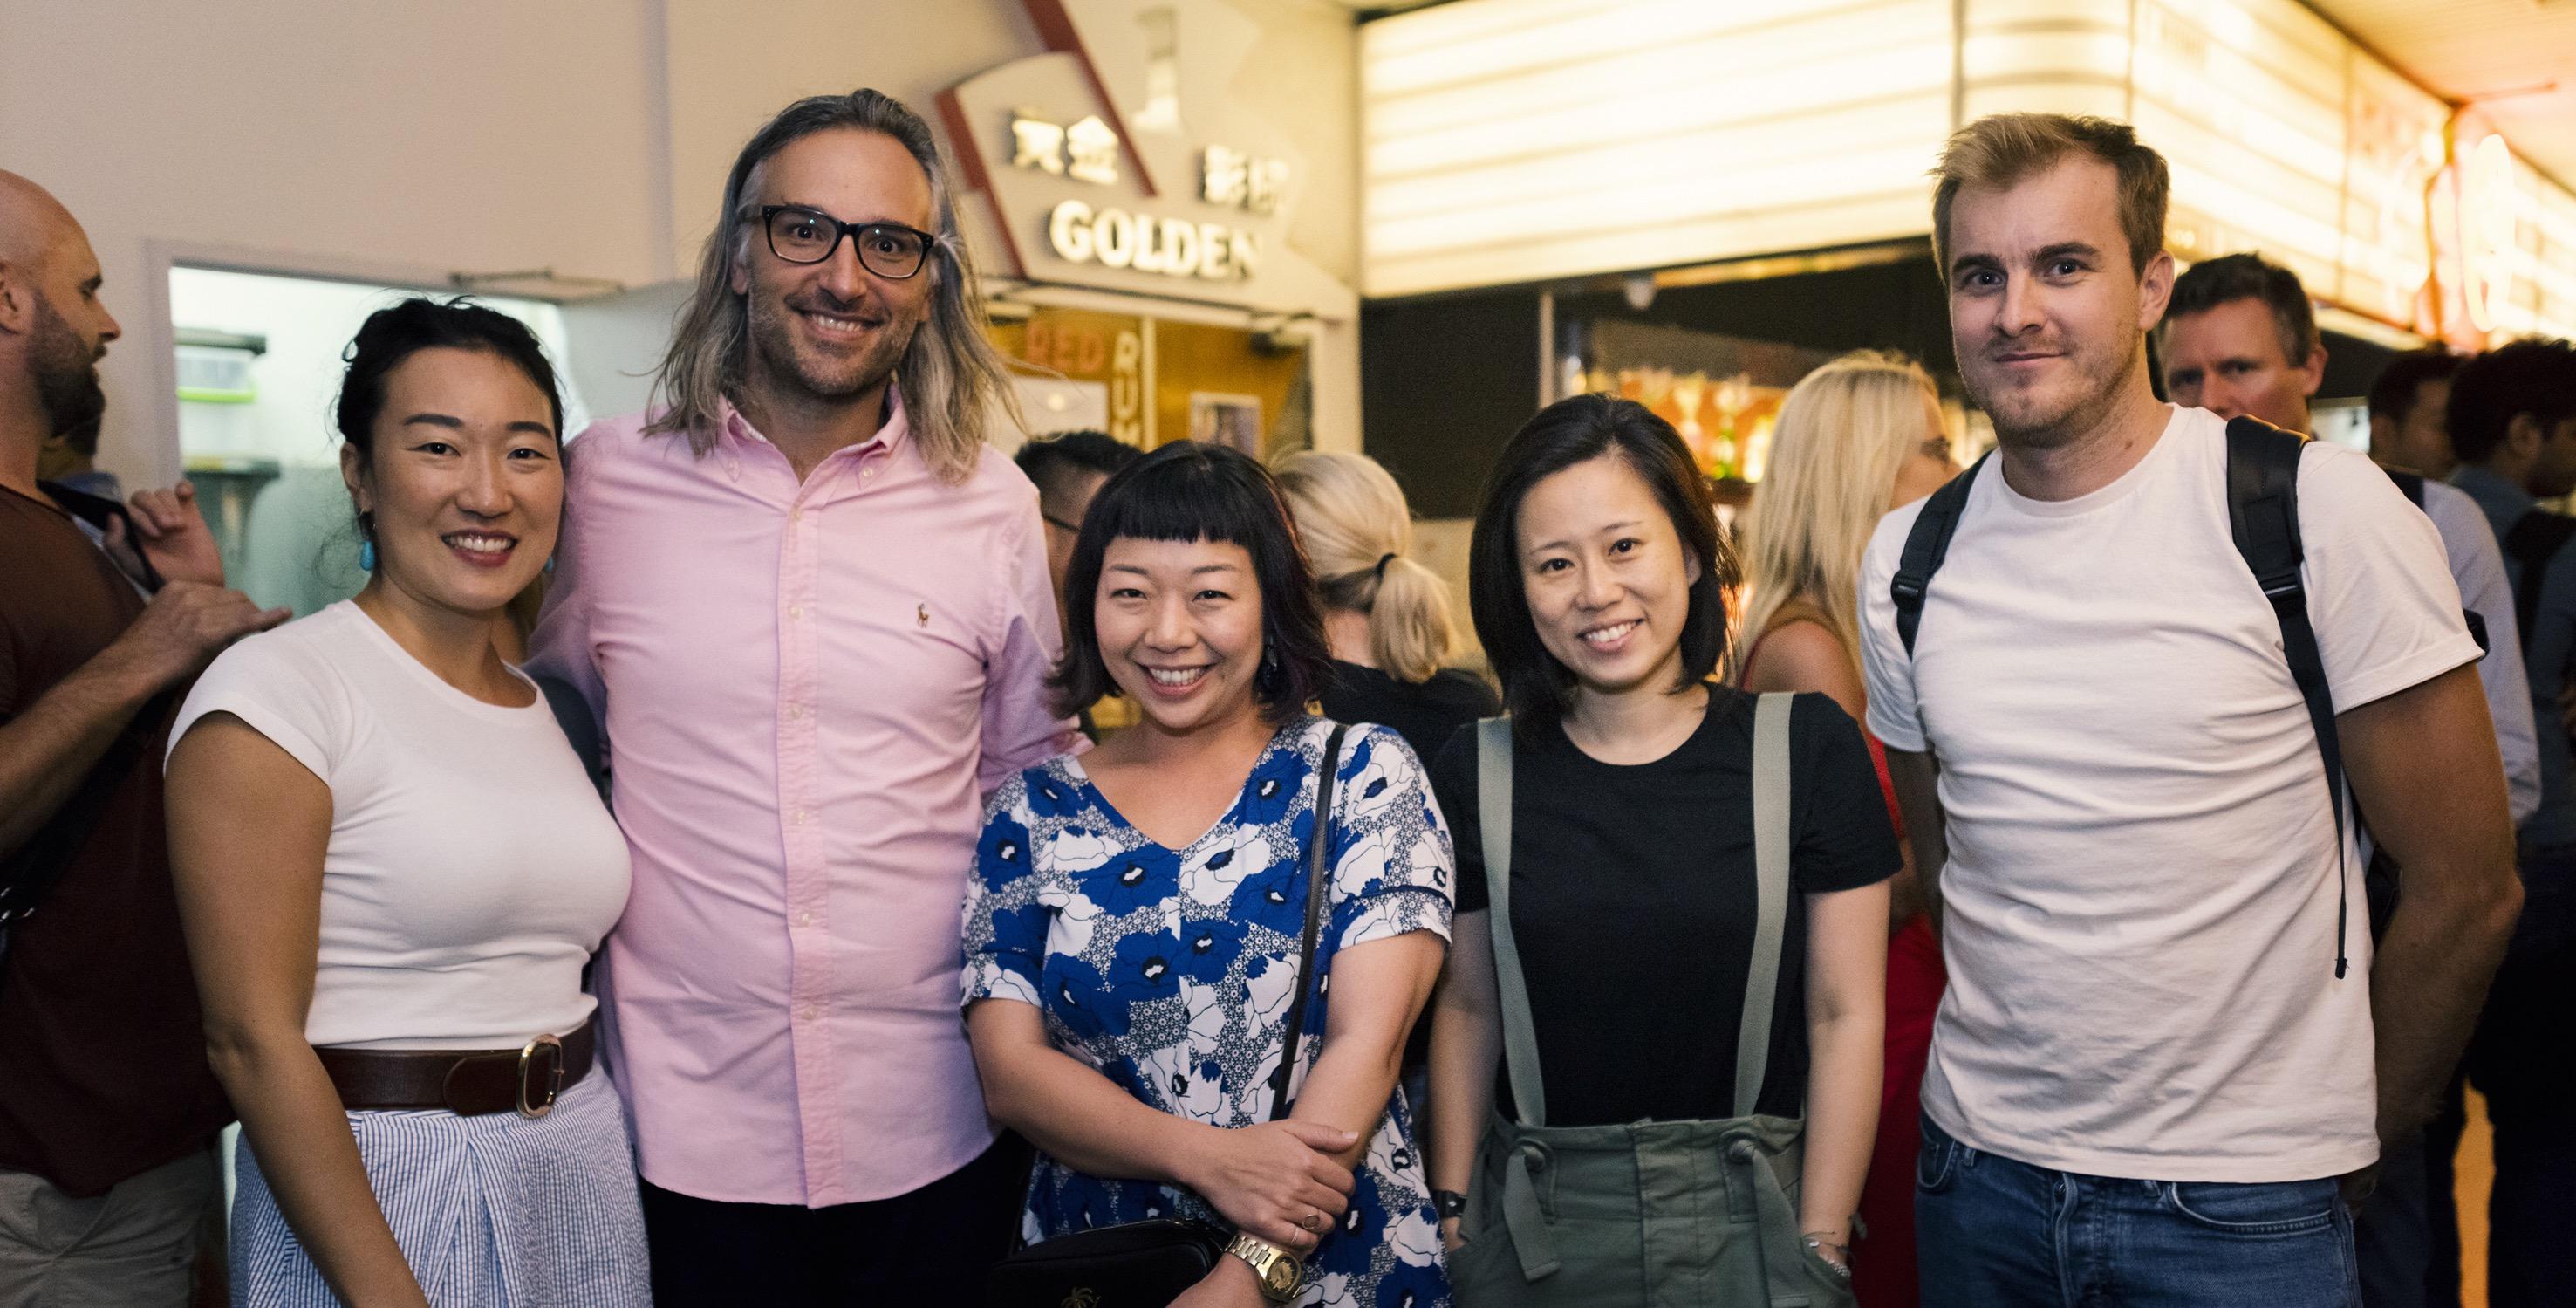 Heckler-backed film 'By The River' selected for Australian Antenna Documentary Film Festival